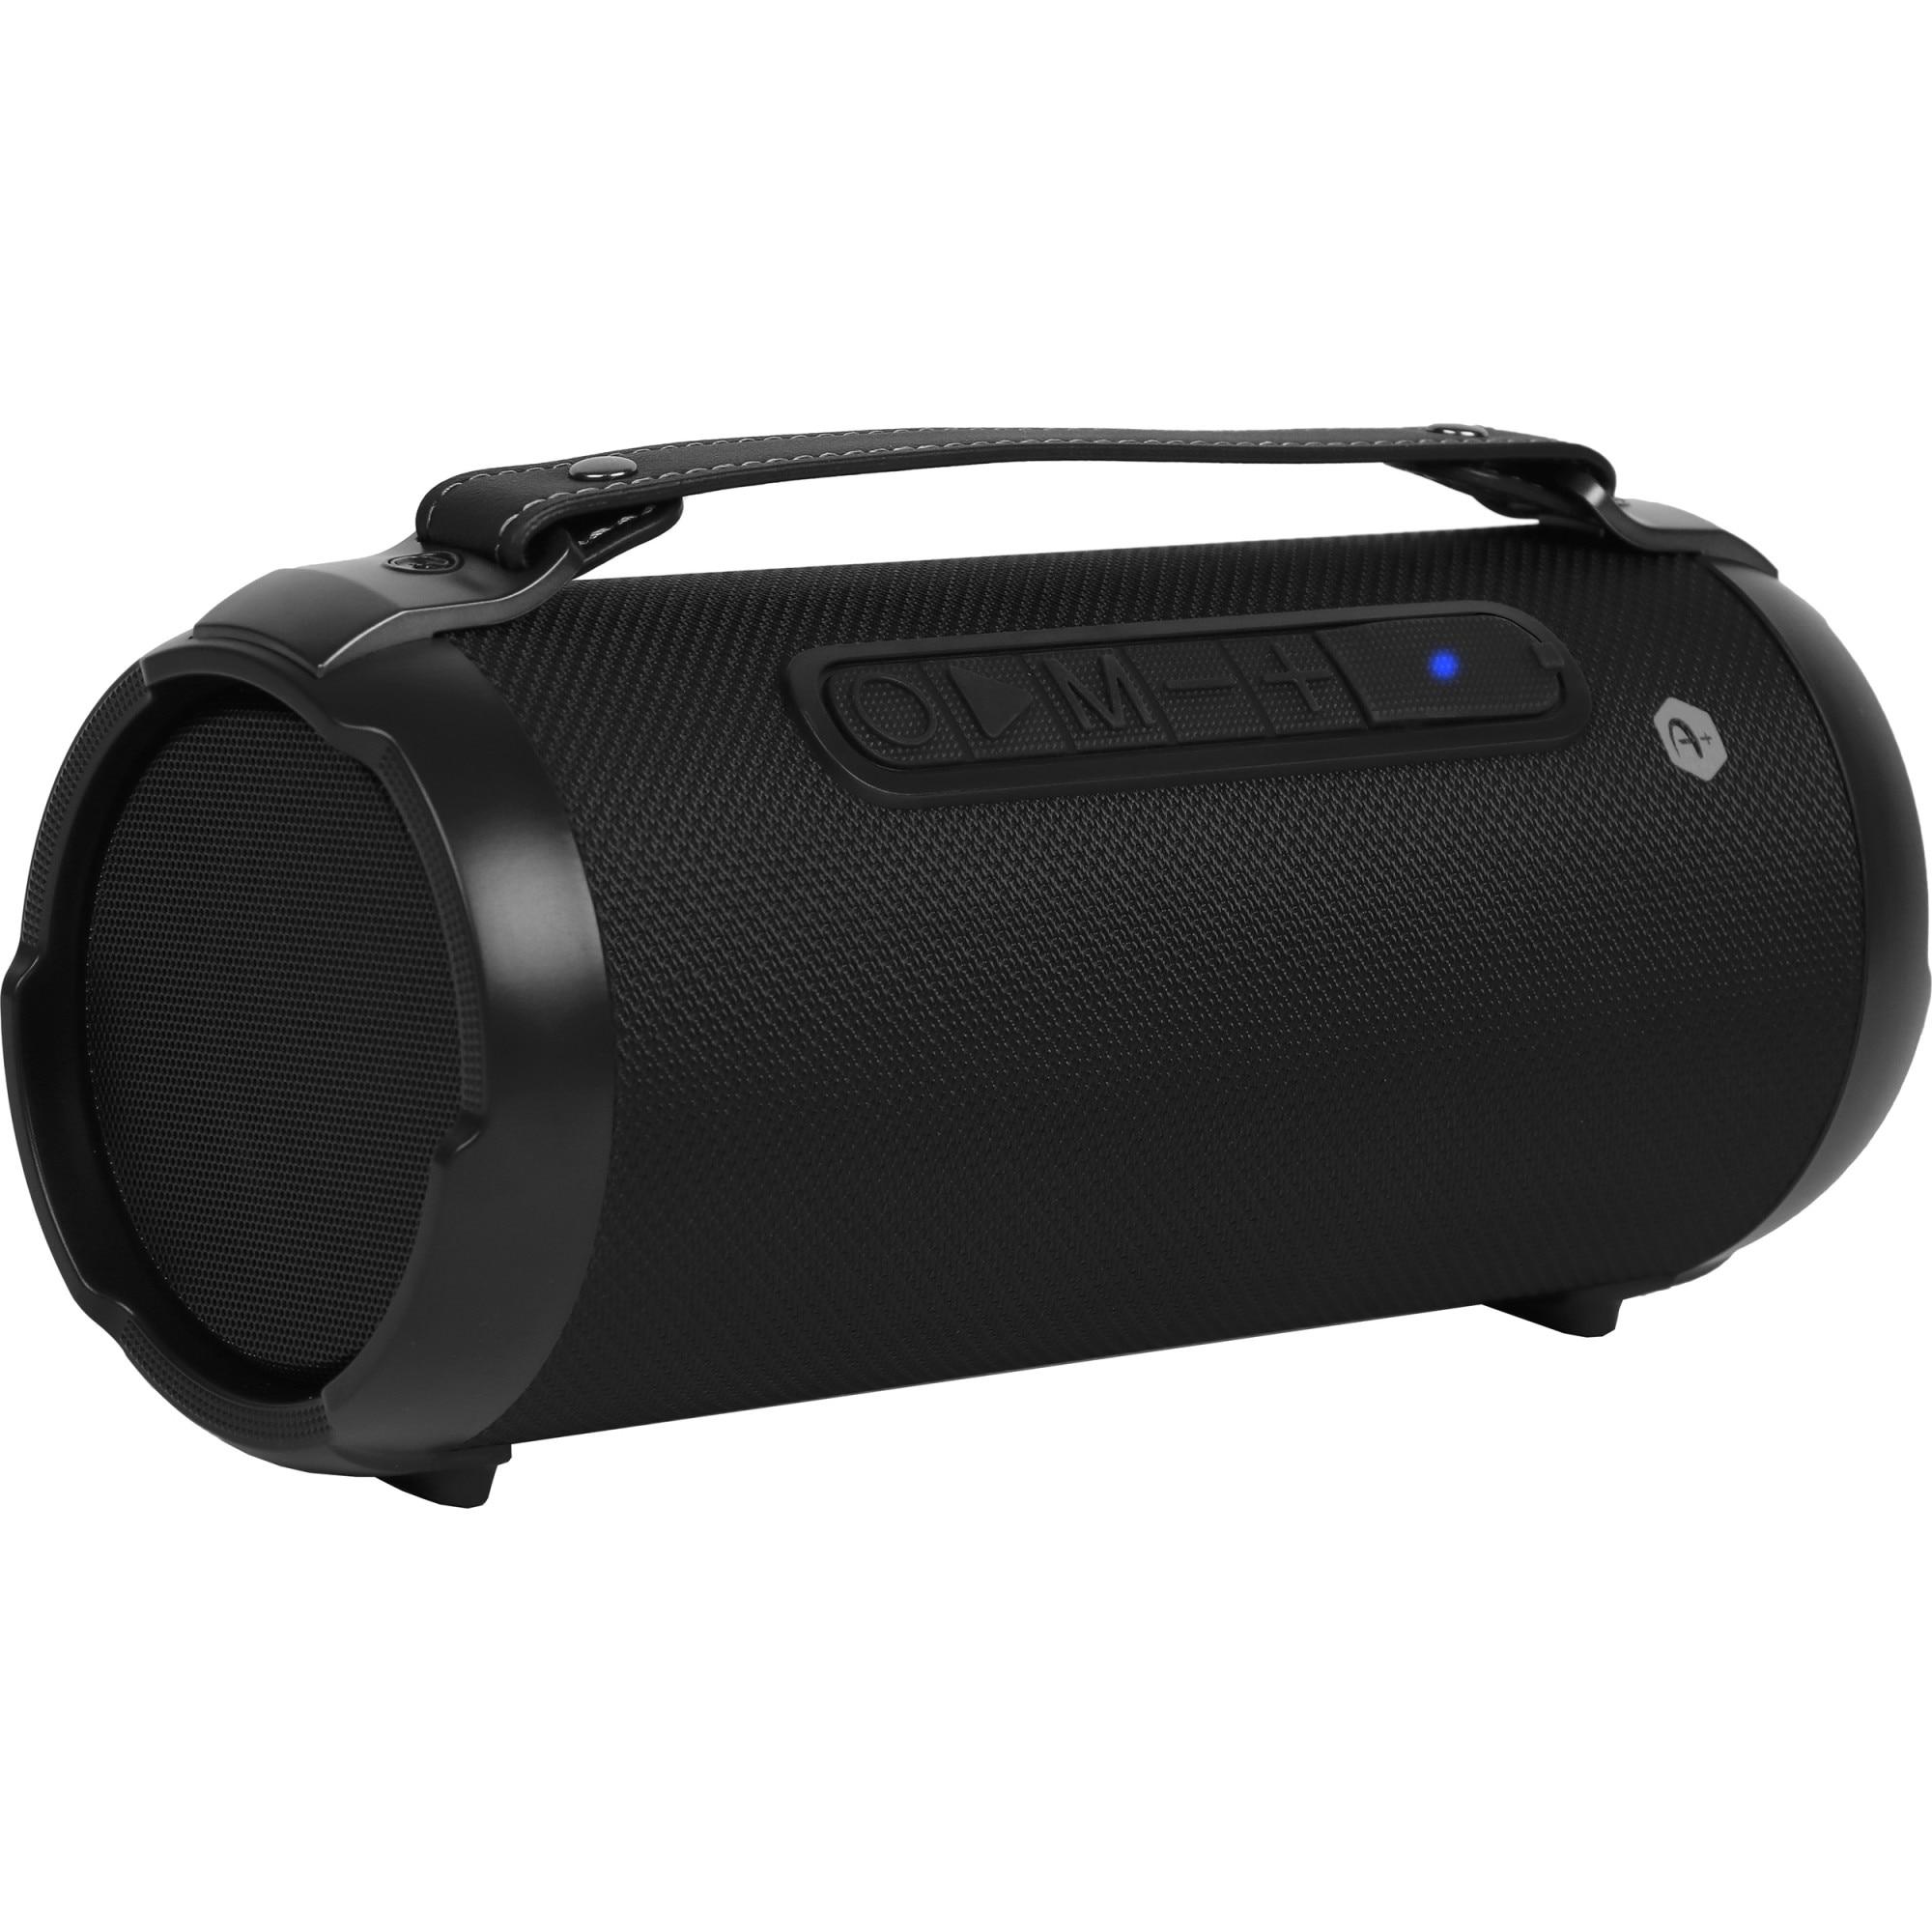 Fotografie Boxa portabila bluetooth A+ Jump, 12W, micro SD, USB port negru